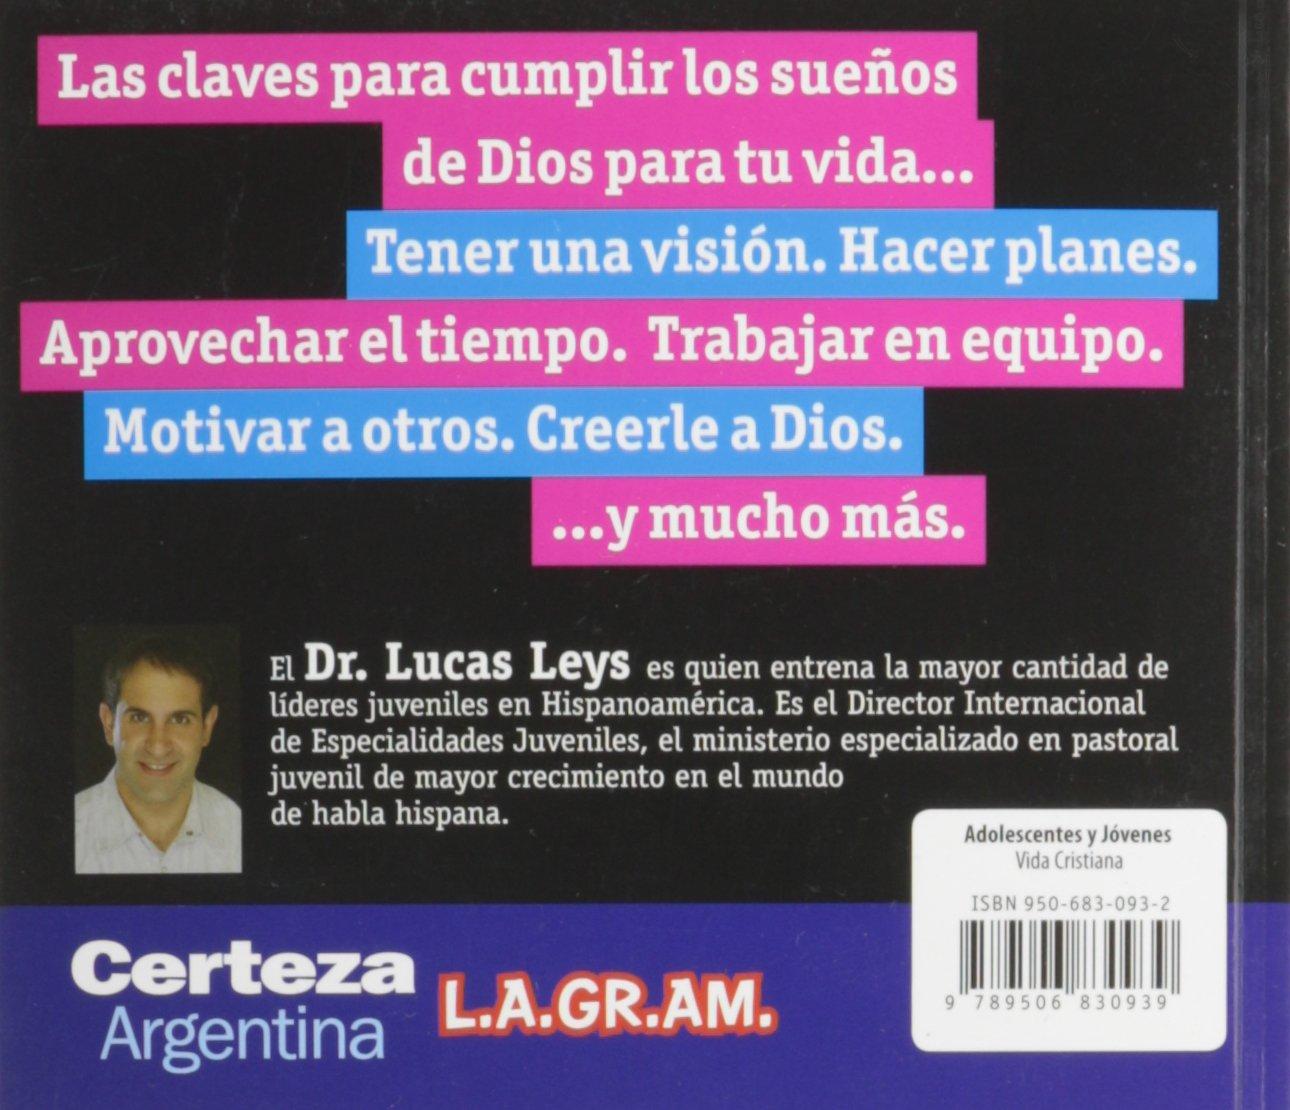 Cómo cumplir tus sueños (Spanish Edition): Lucas Leys: 9789506830939: Amazon.com: Books